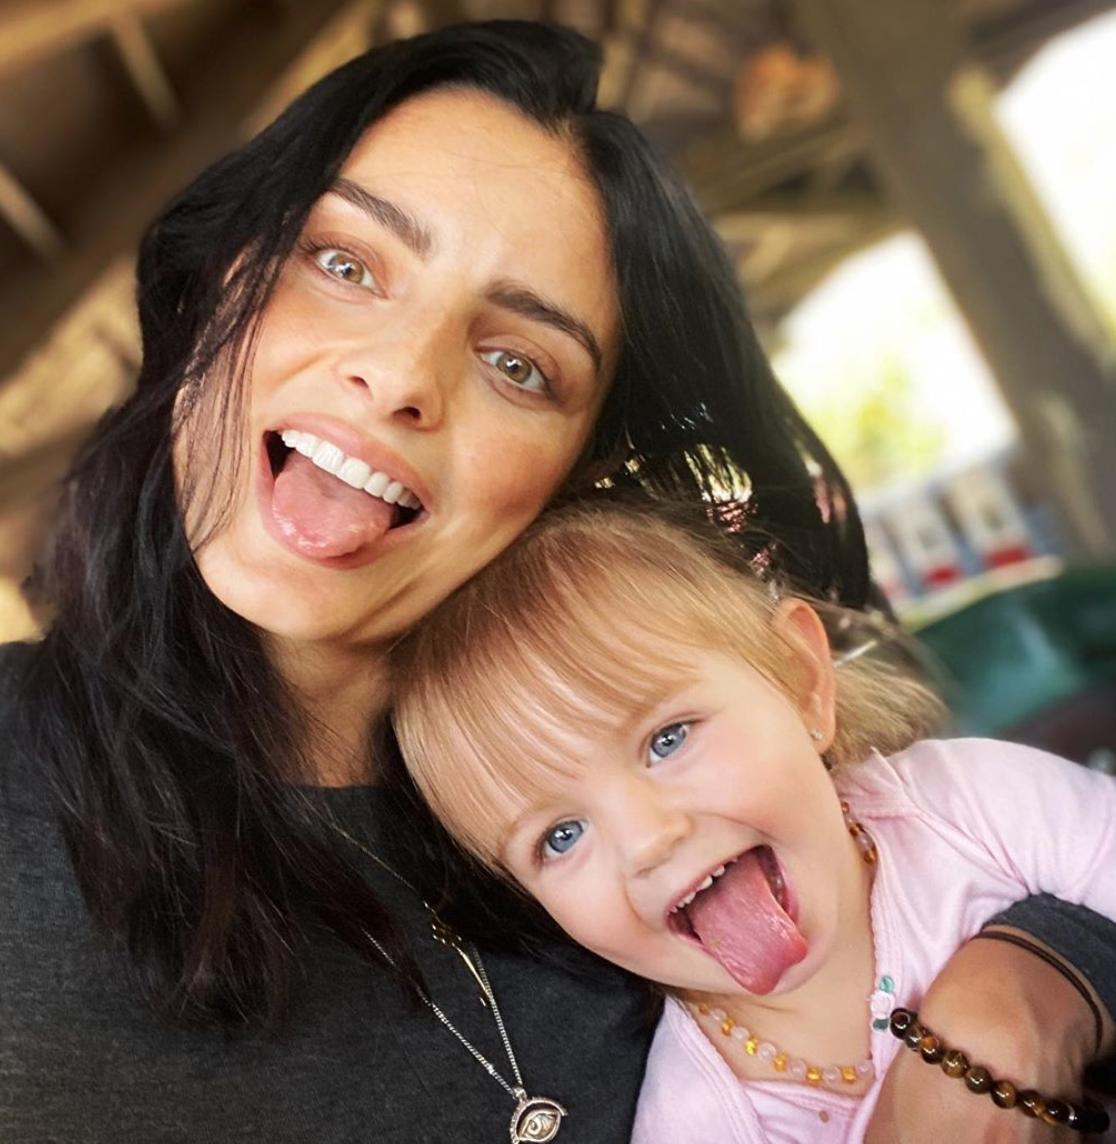 Aislinn Derbez con su hija